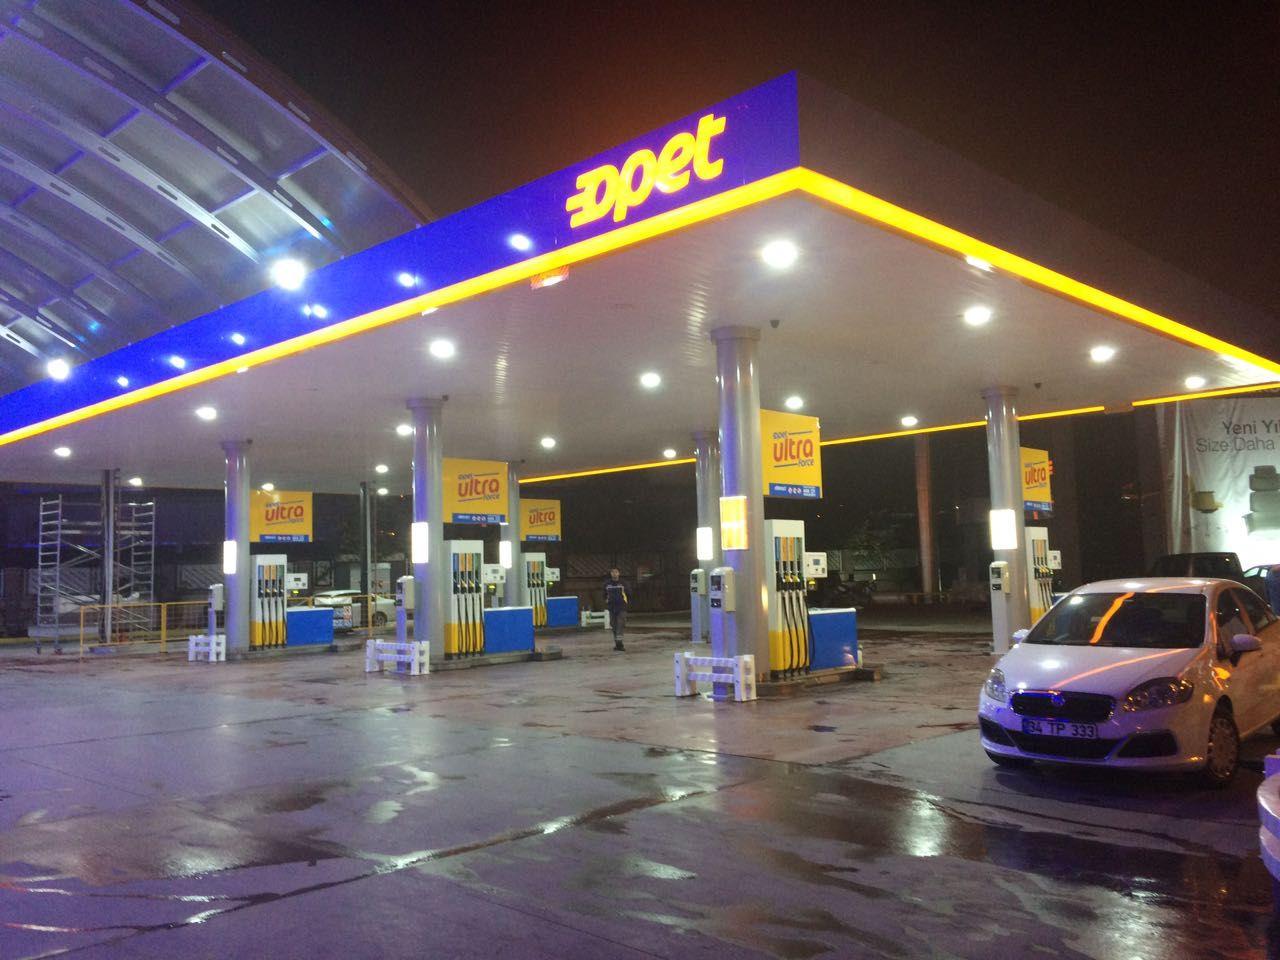 Tunc Petrol Istanbul Opet Fuchs Emeklerinden Dolayi Bolge